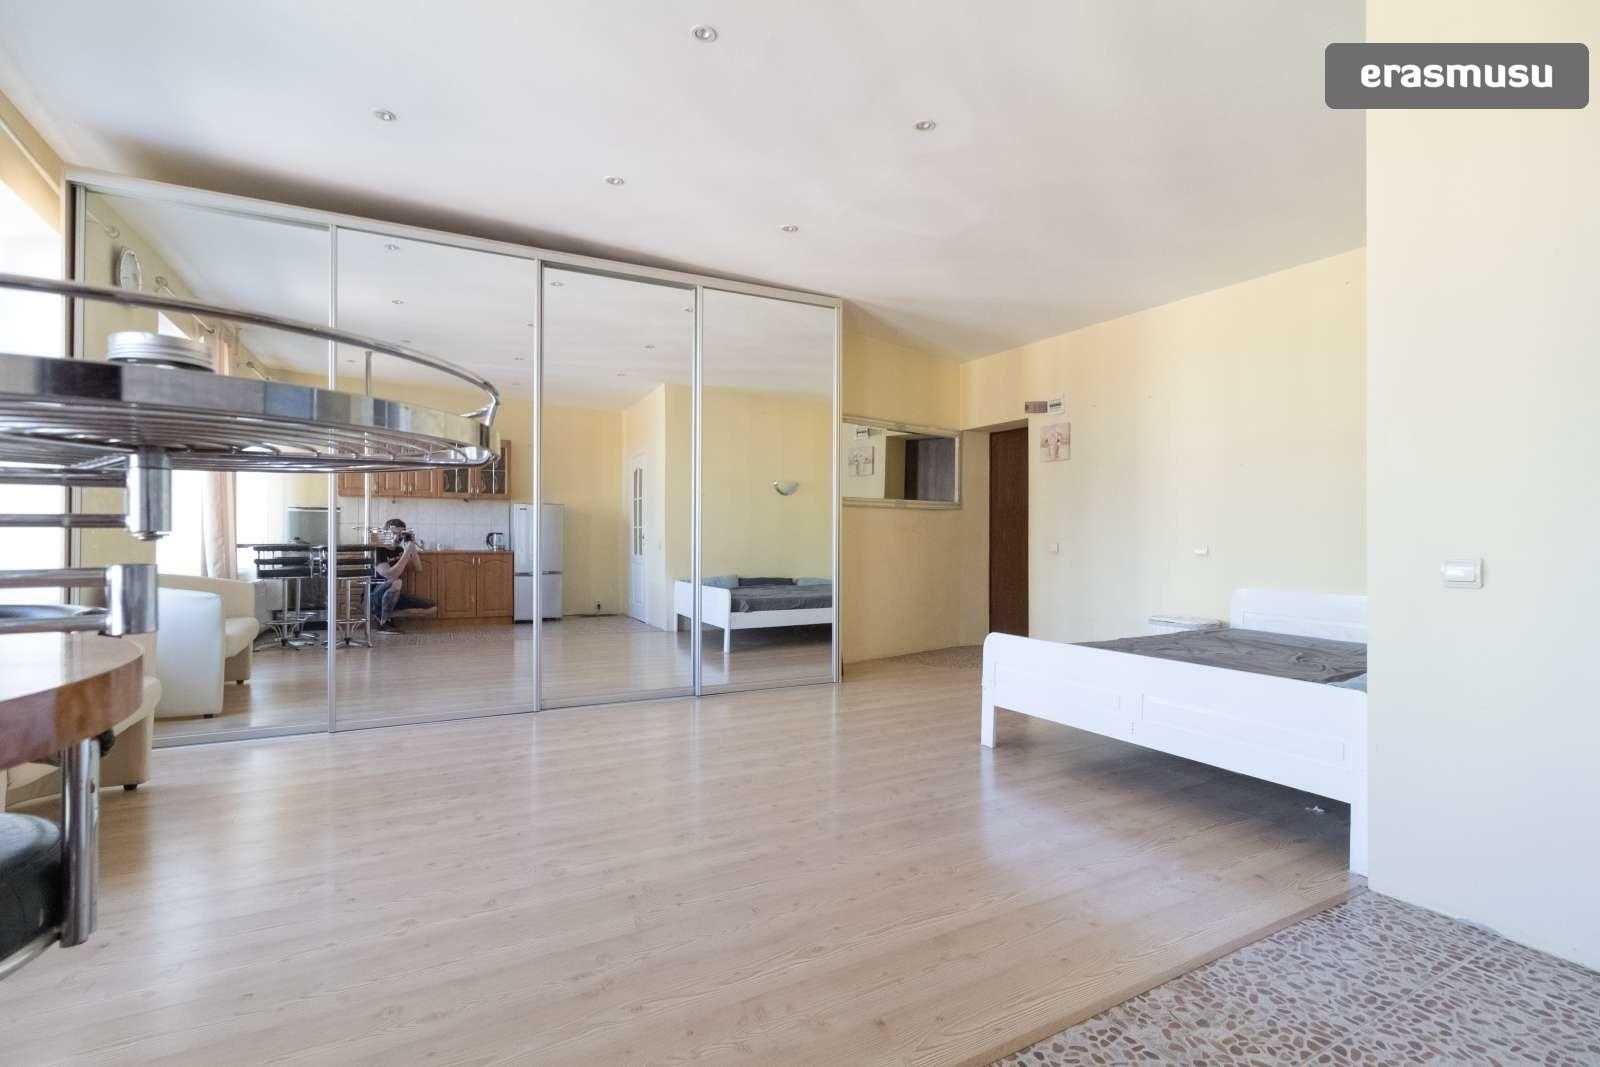 bright-studio-apartment-rent-centrs-5061df14d857467ced1c55ece161